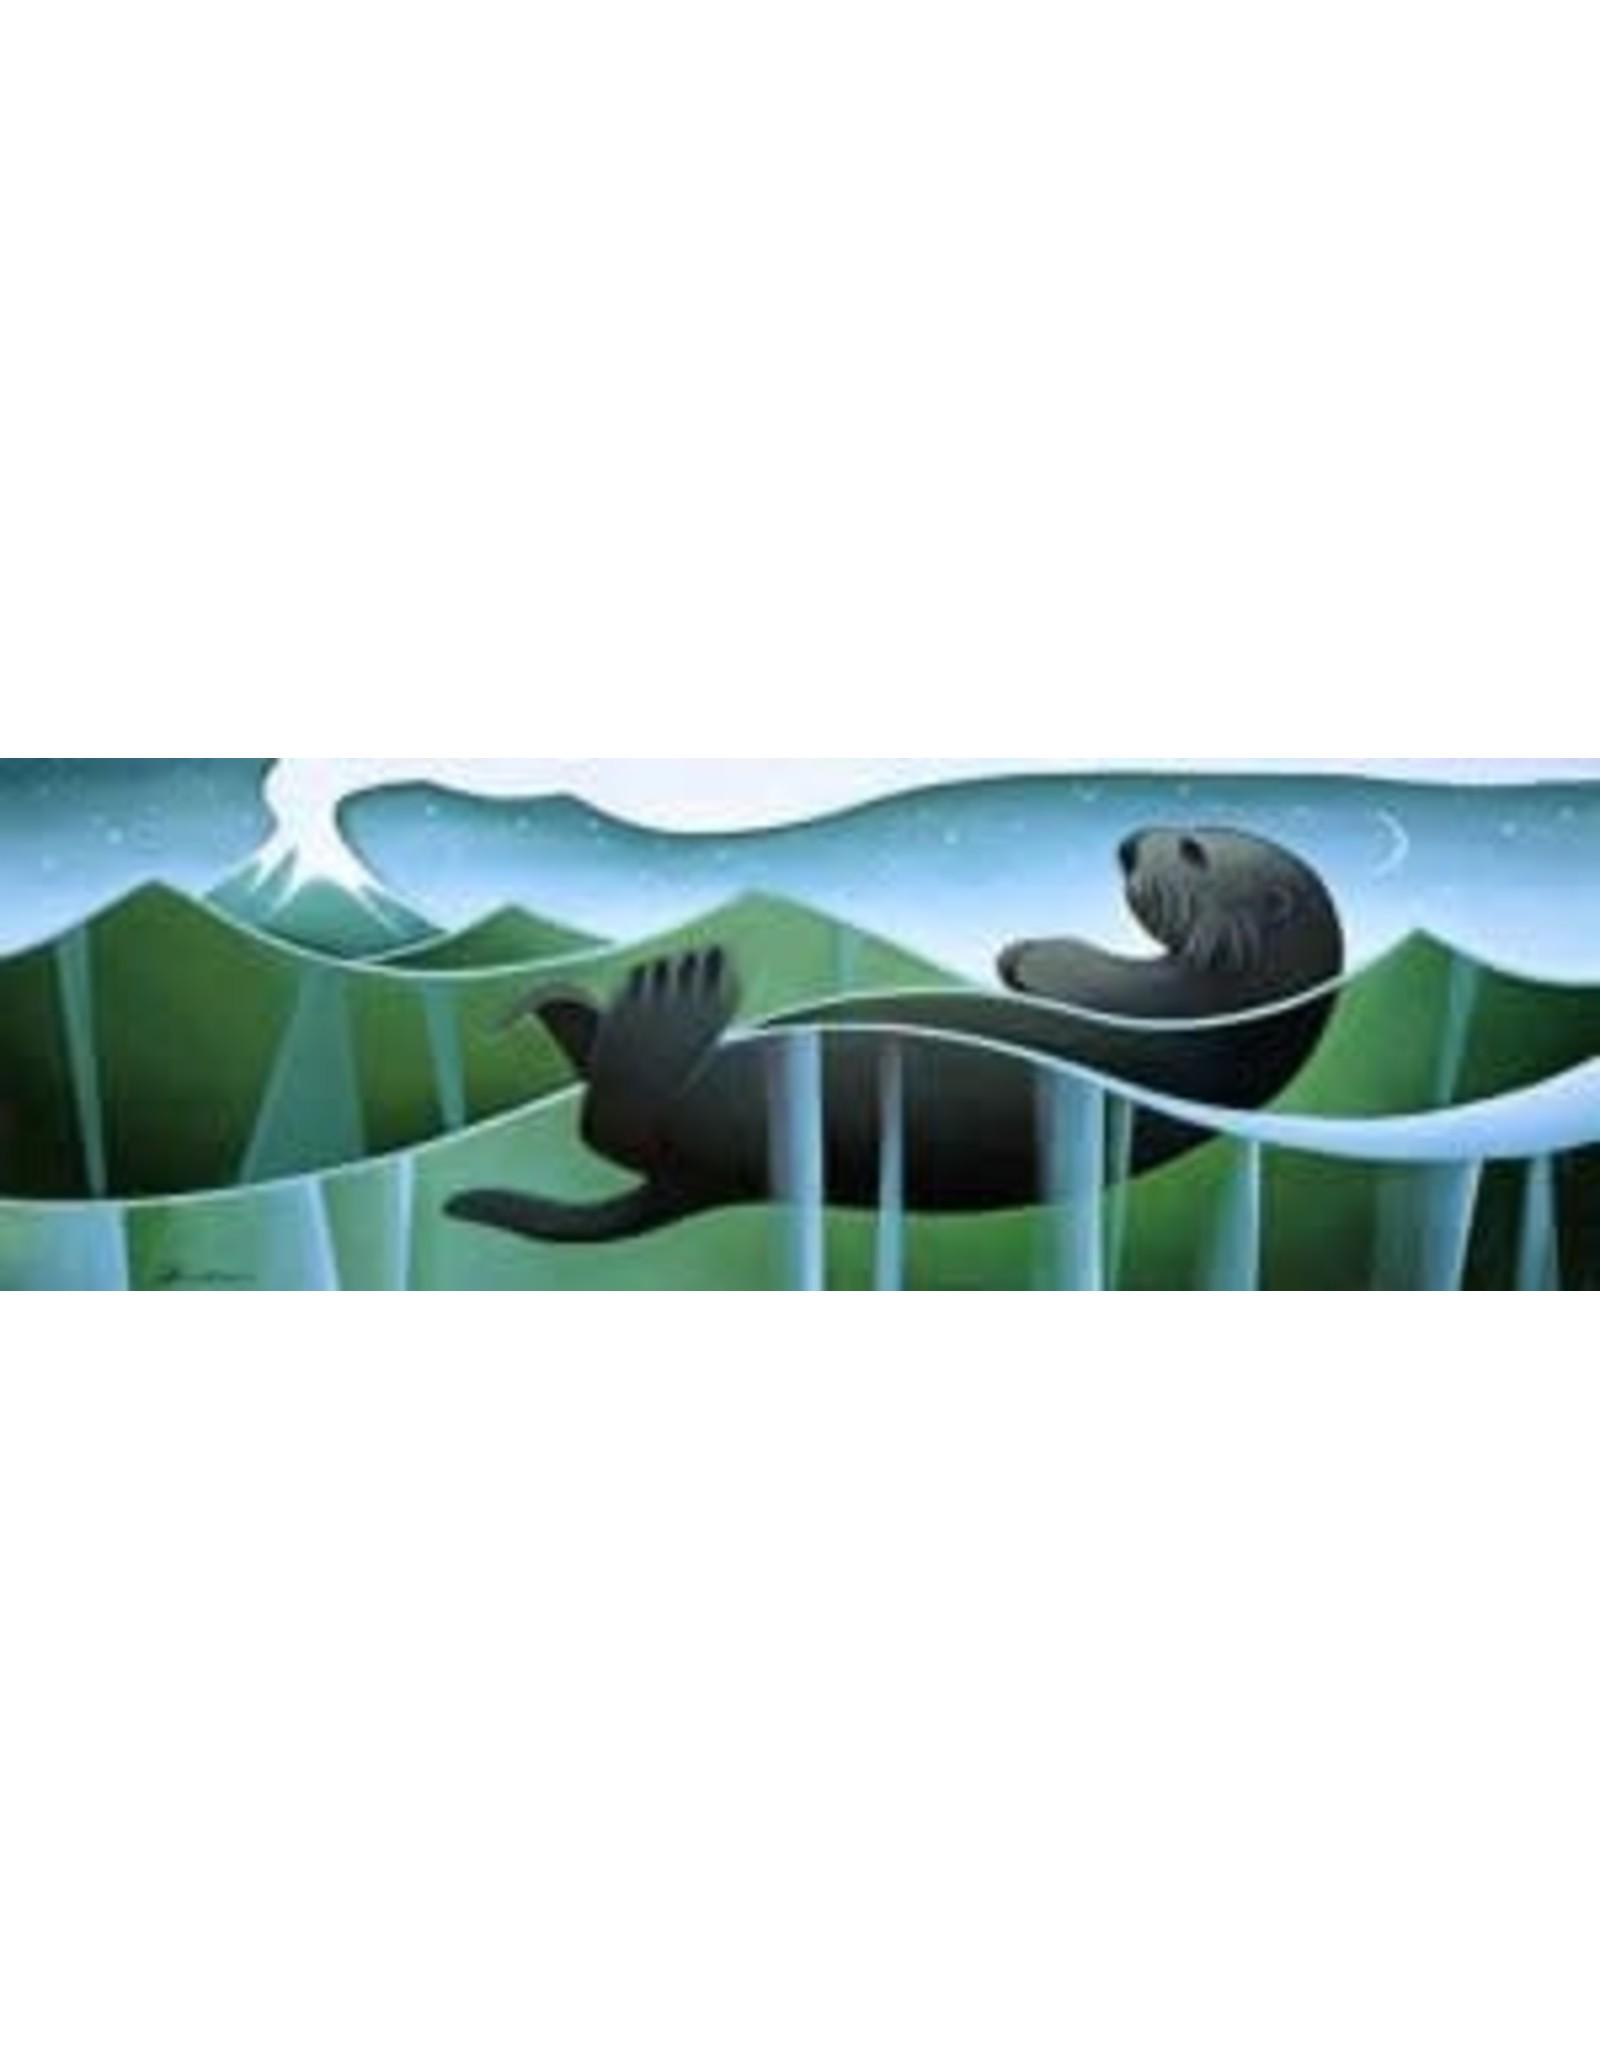 Nathalie Parenteau Sea Otter and Volcano (art card) | Nathalie Parenteau